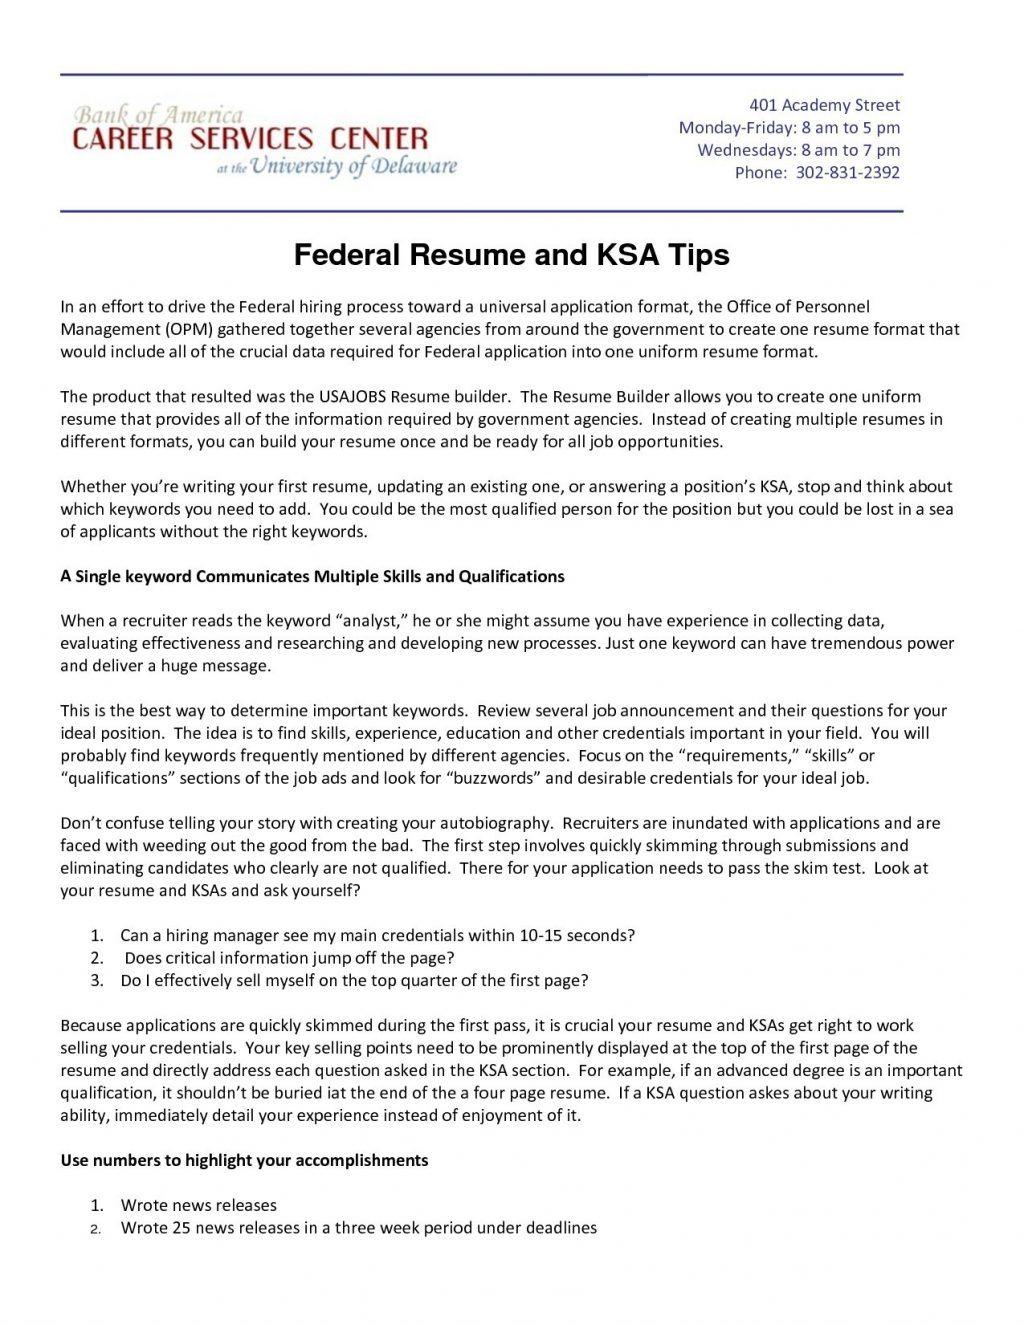 Resume Ksa Examples